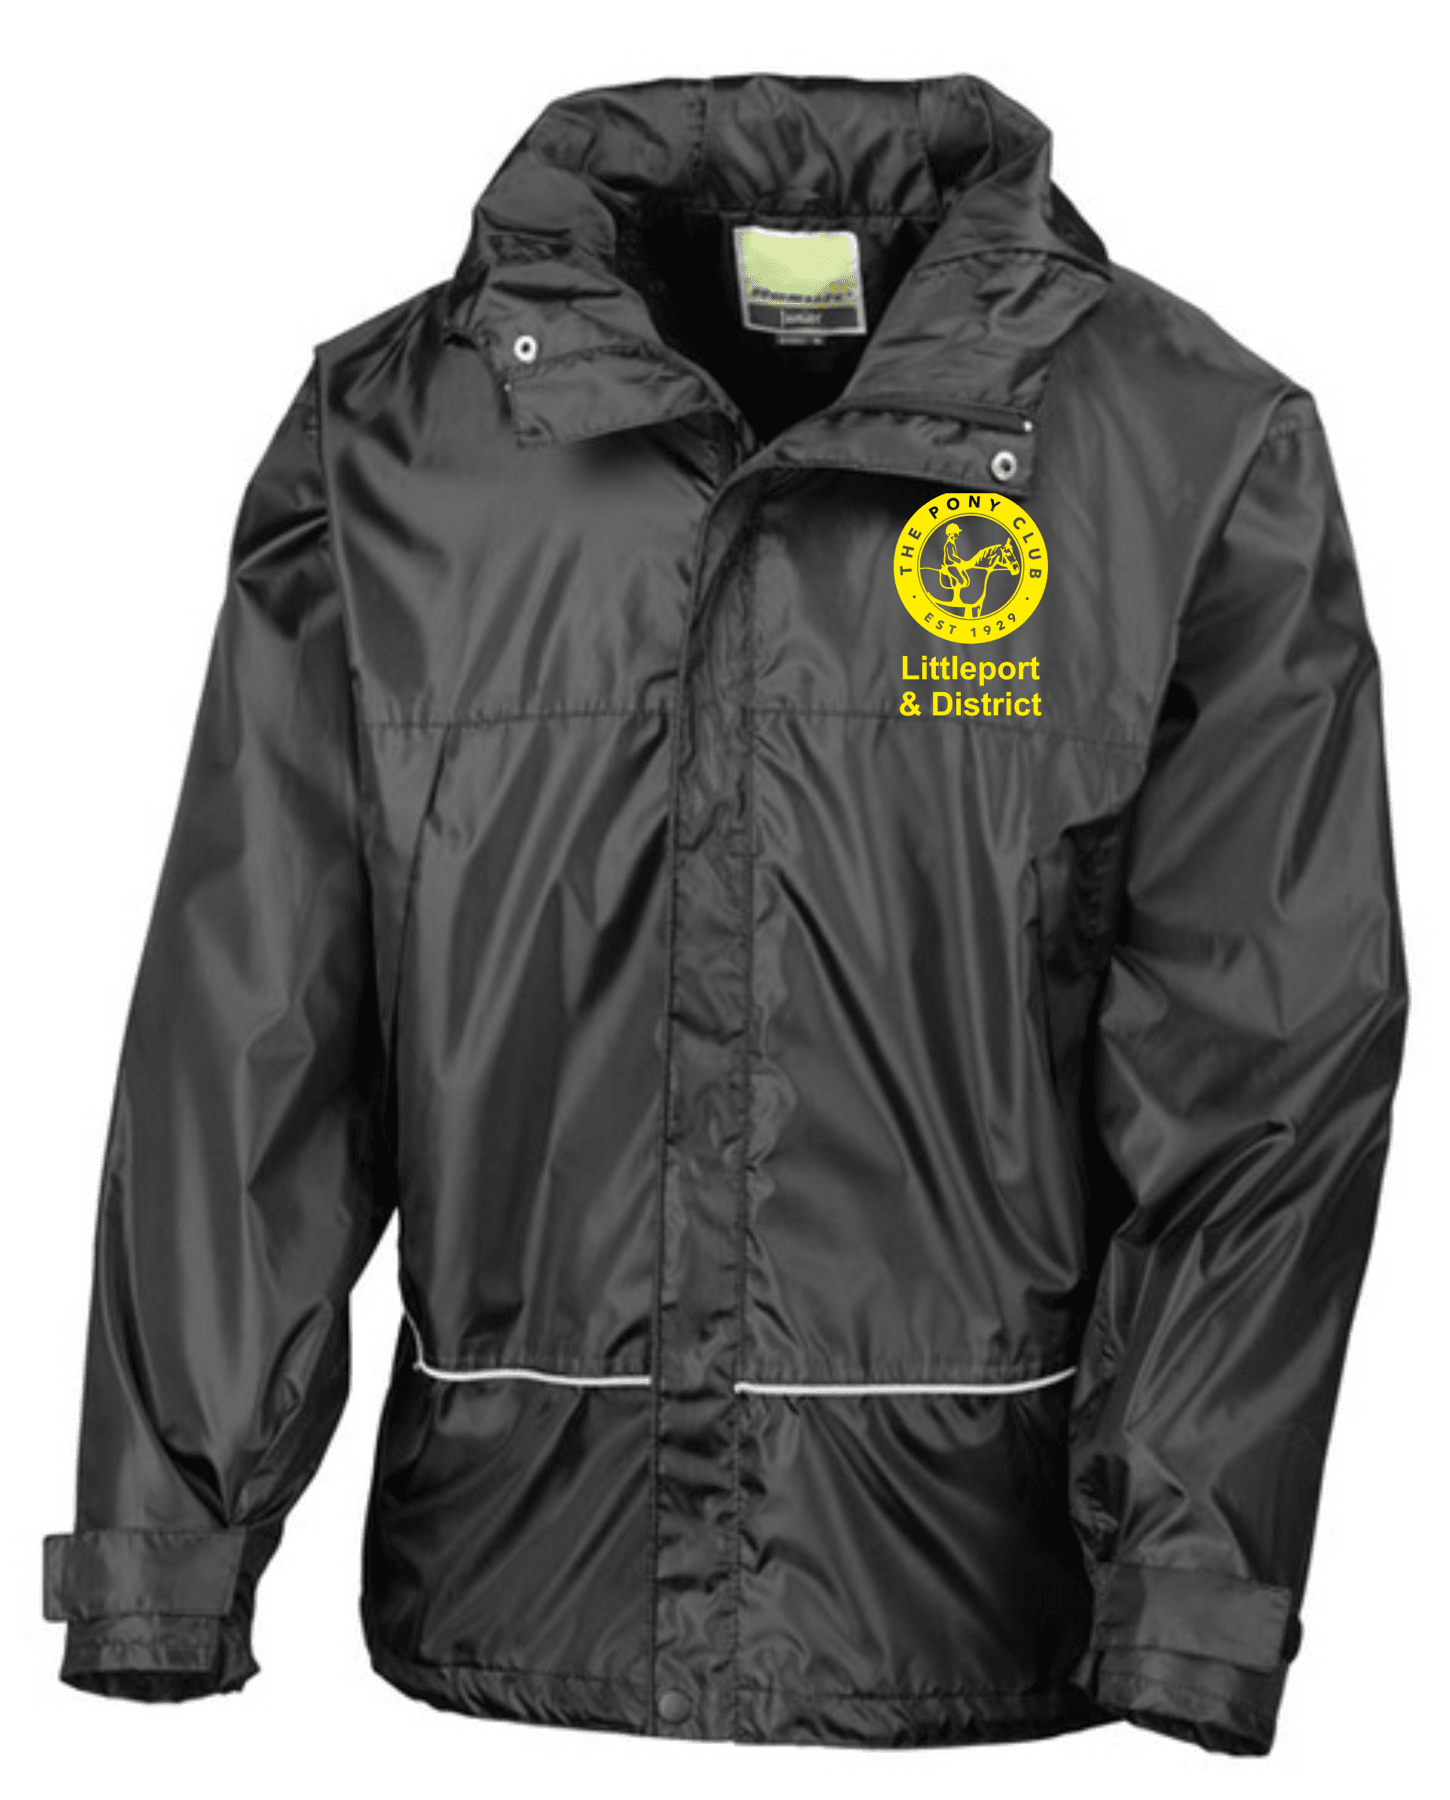 Littleport & District Pony Club – Waterproof Jacket Junior